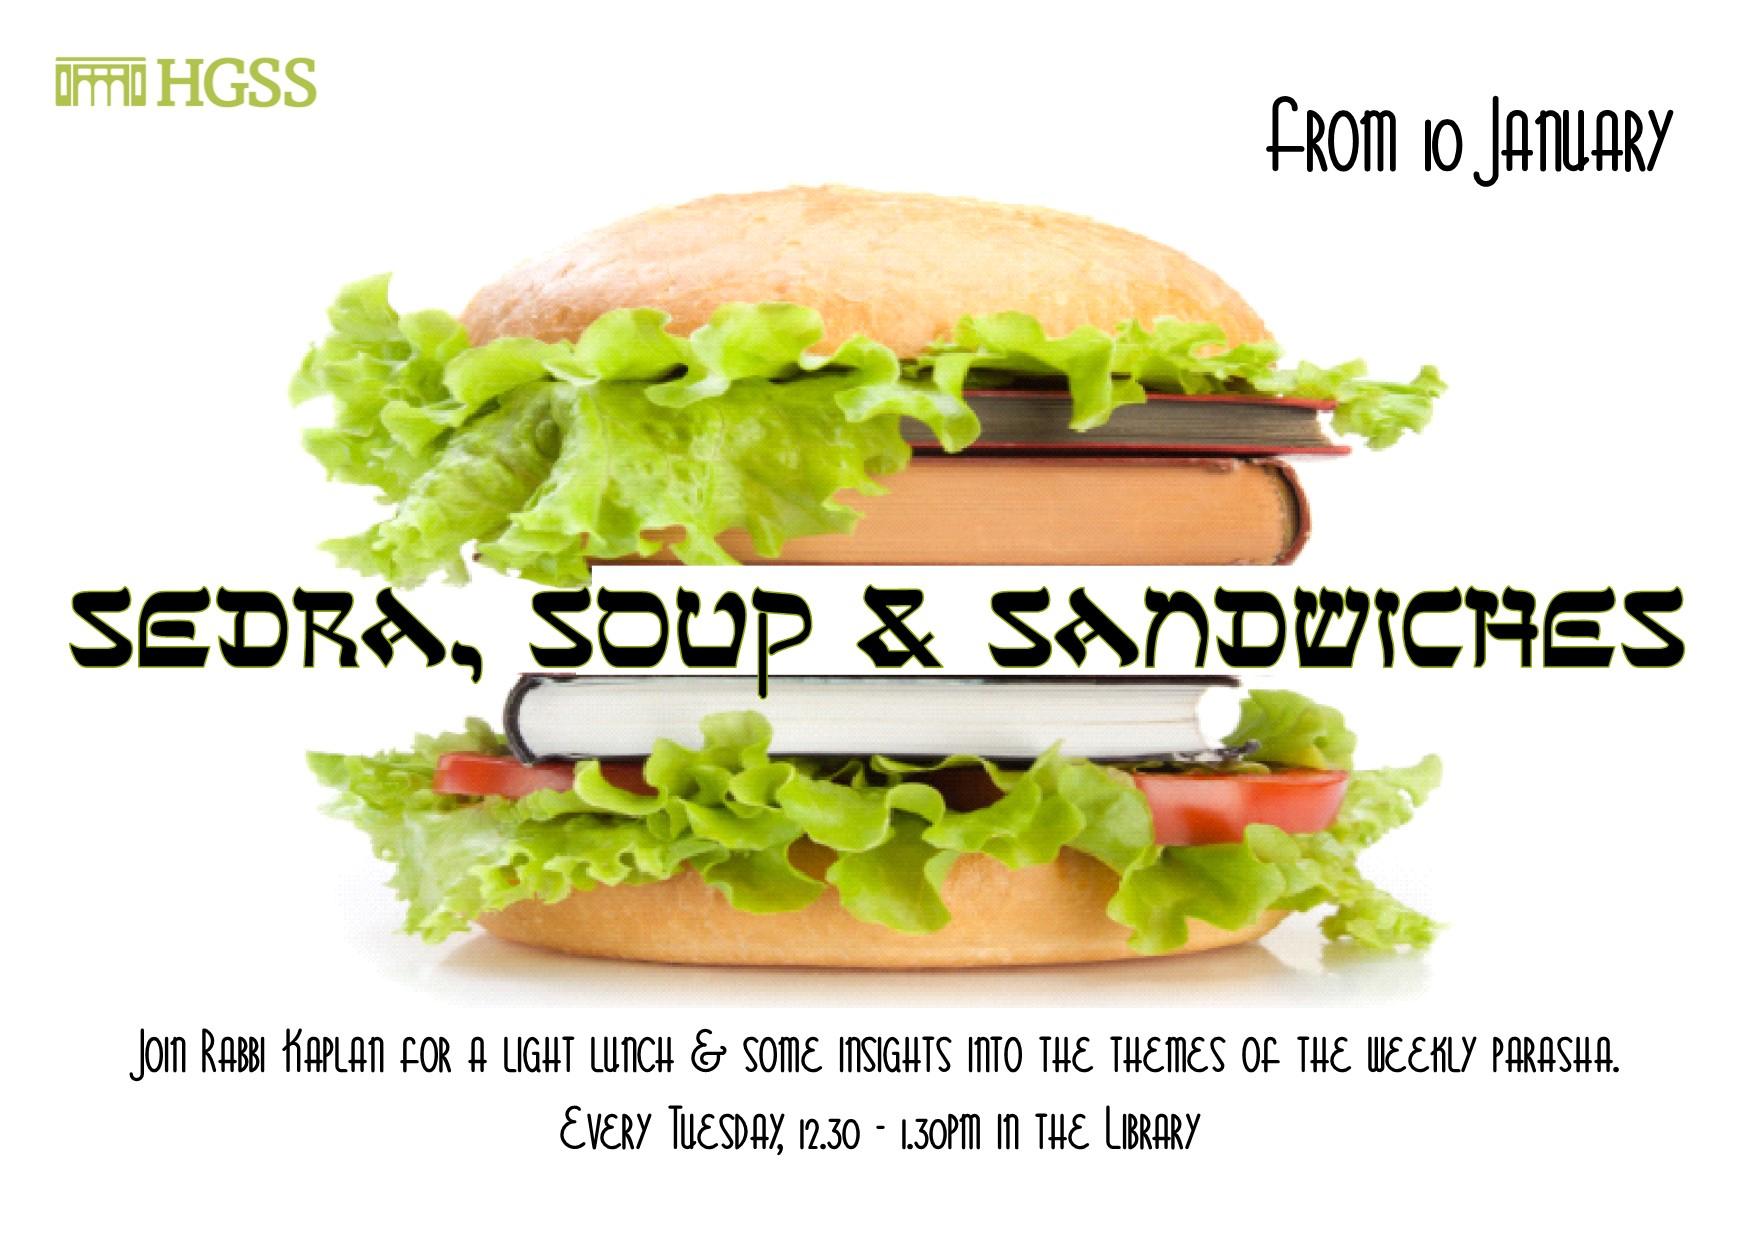 Sedra, Soup & Sandwich